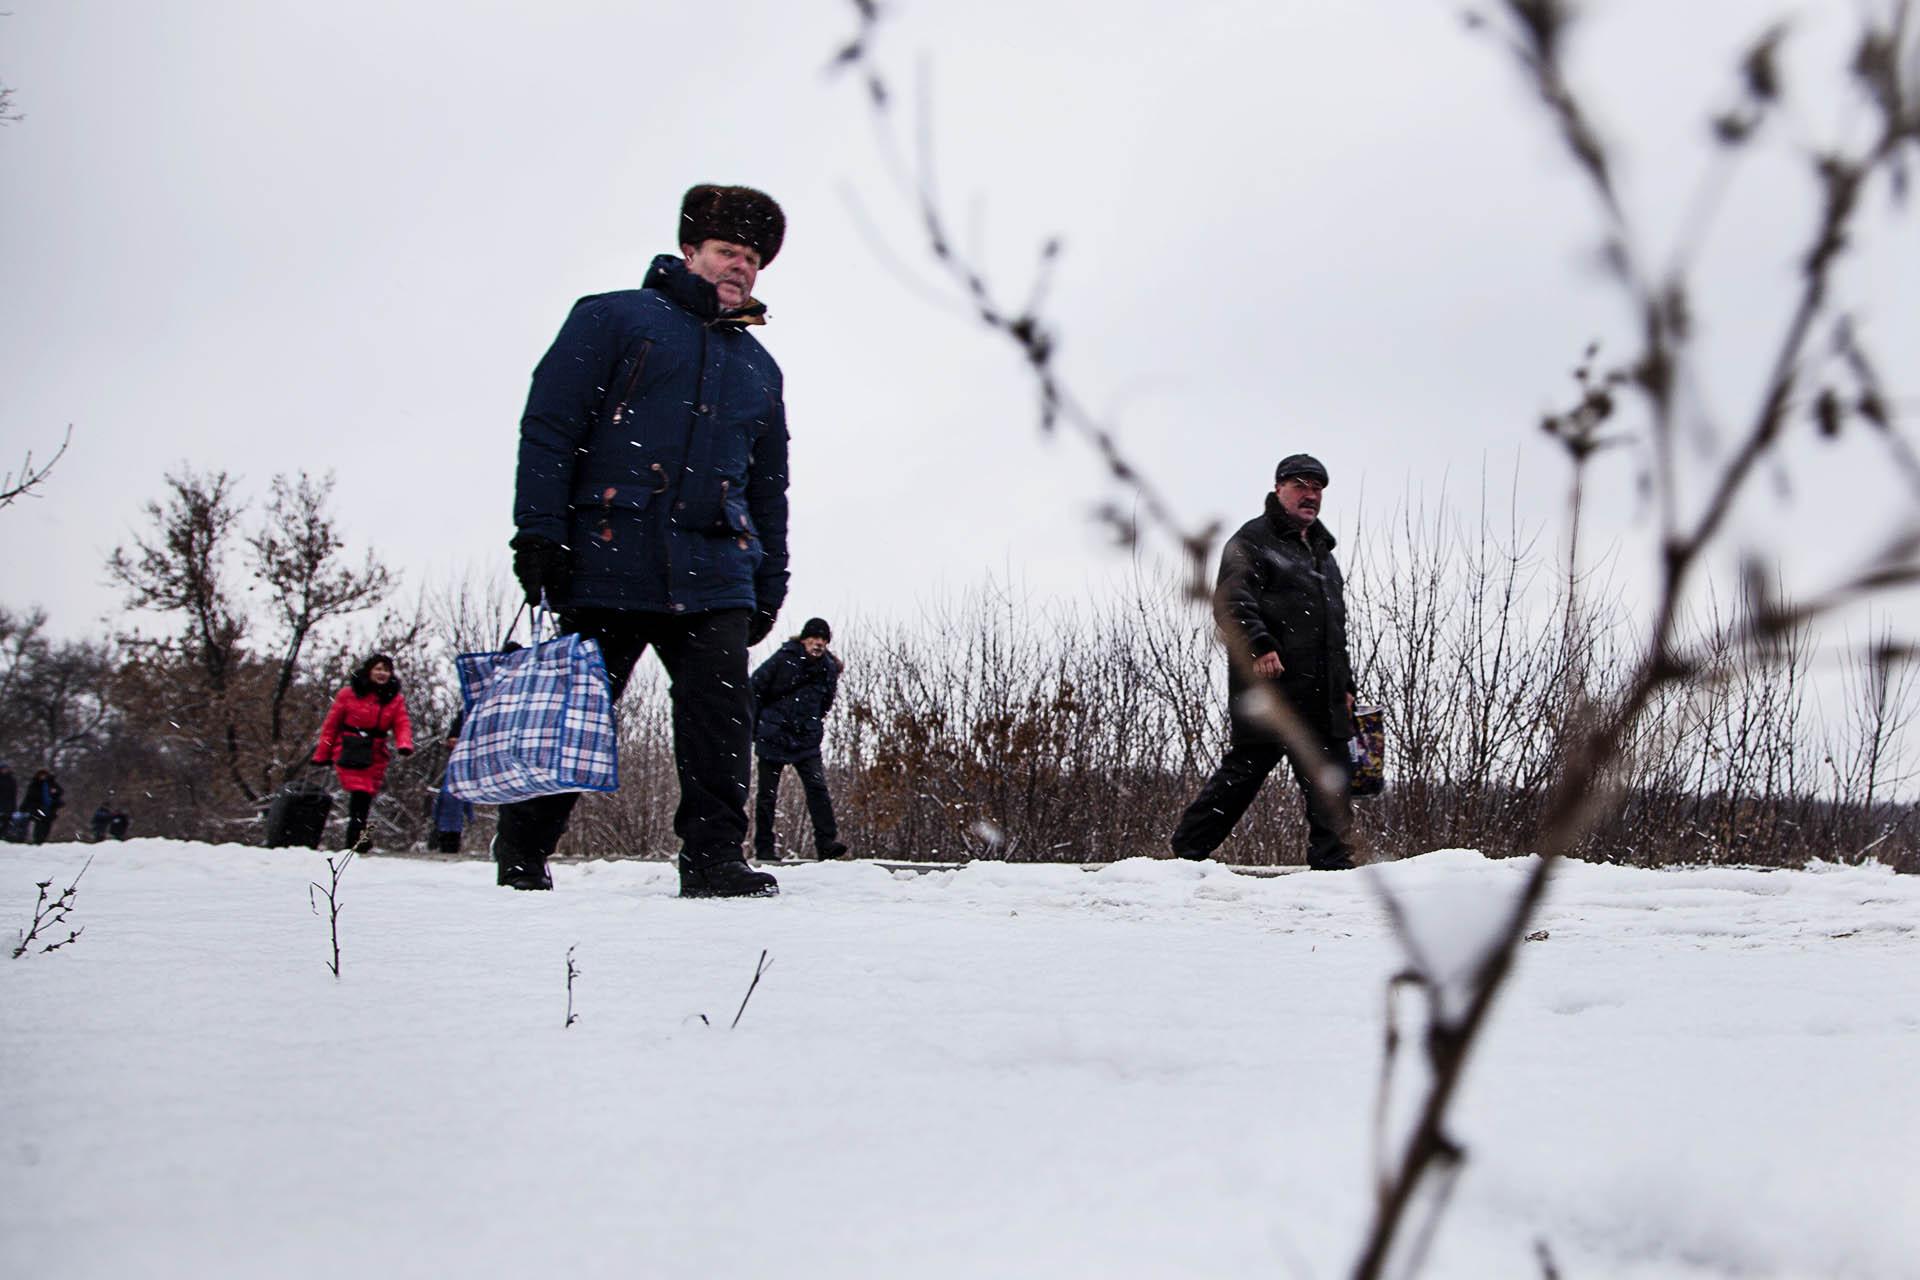 Civiles cruzando la línea de frente hacia territorio rebelde.